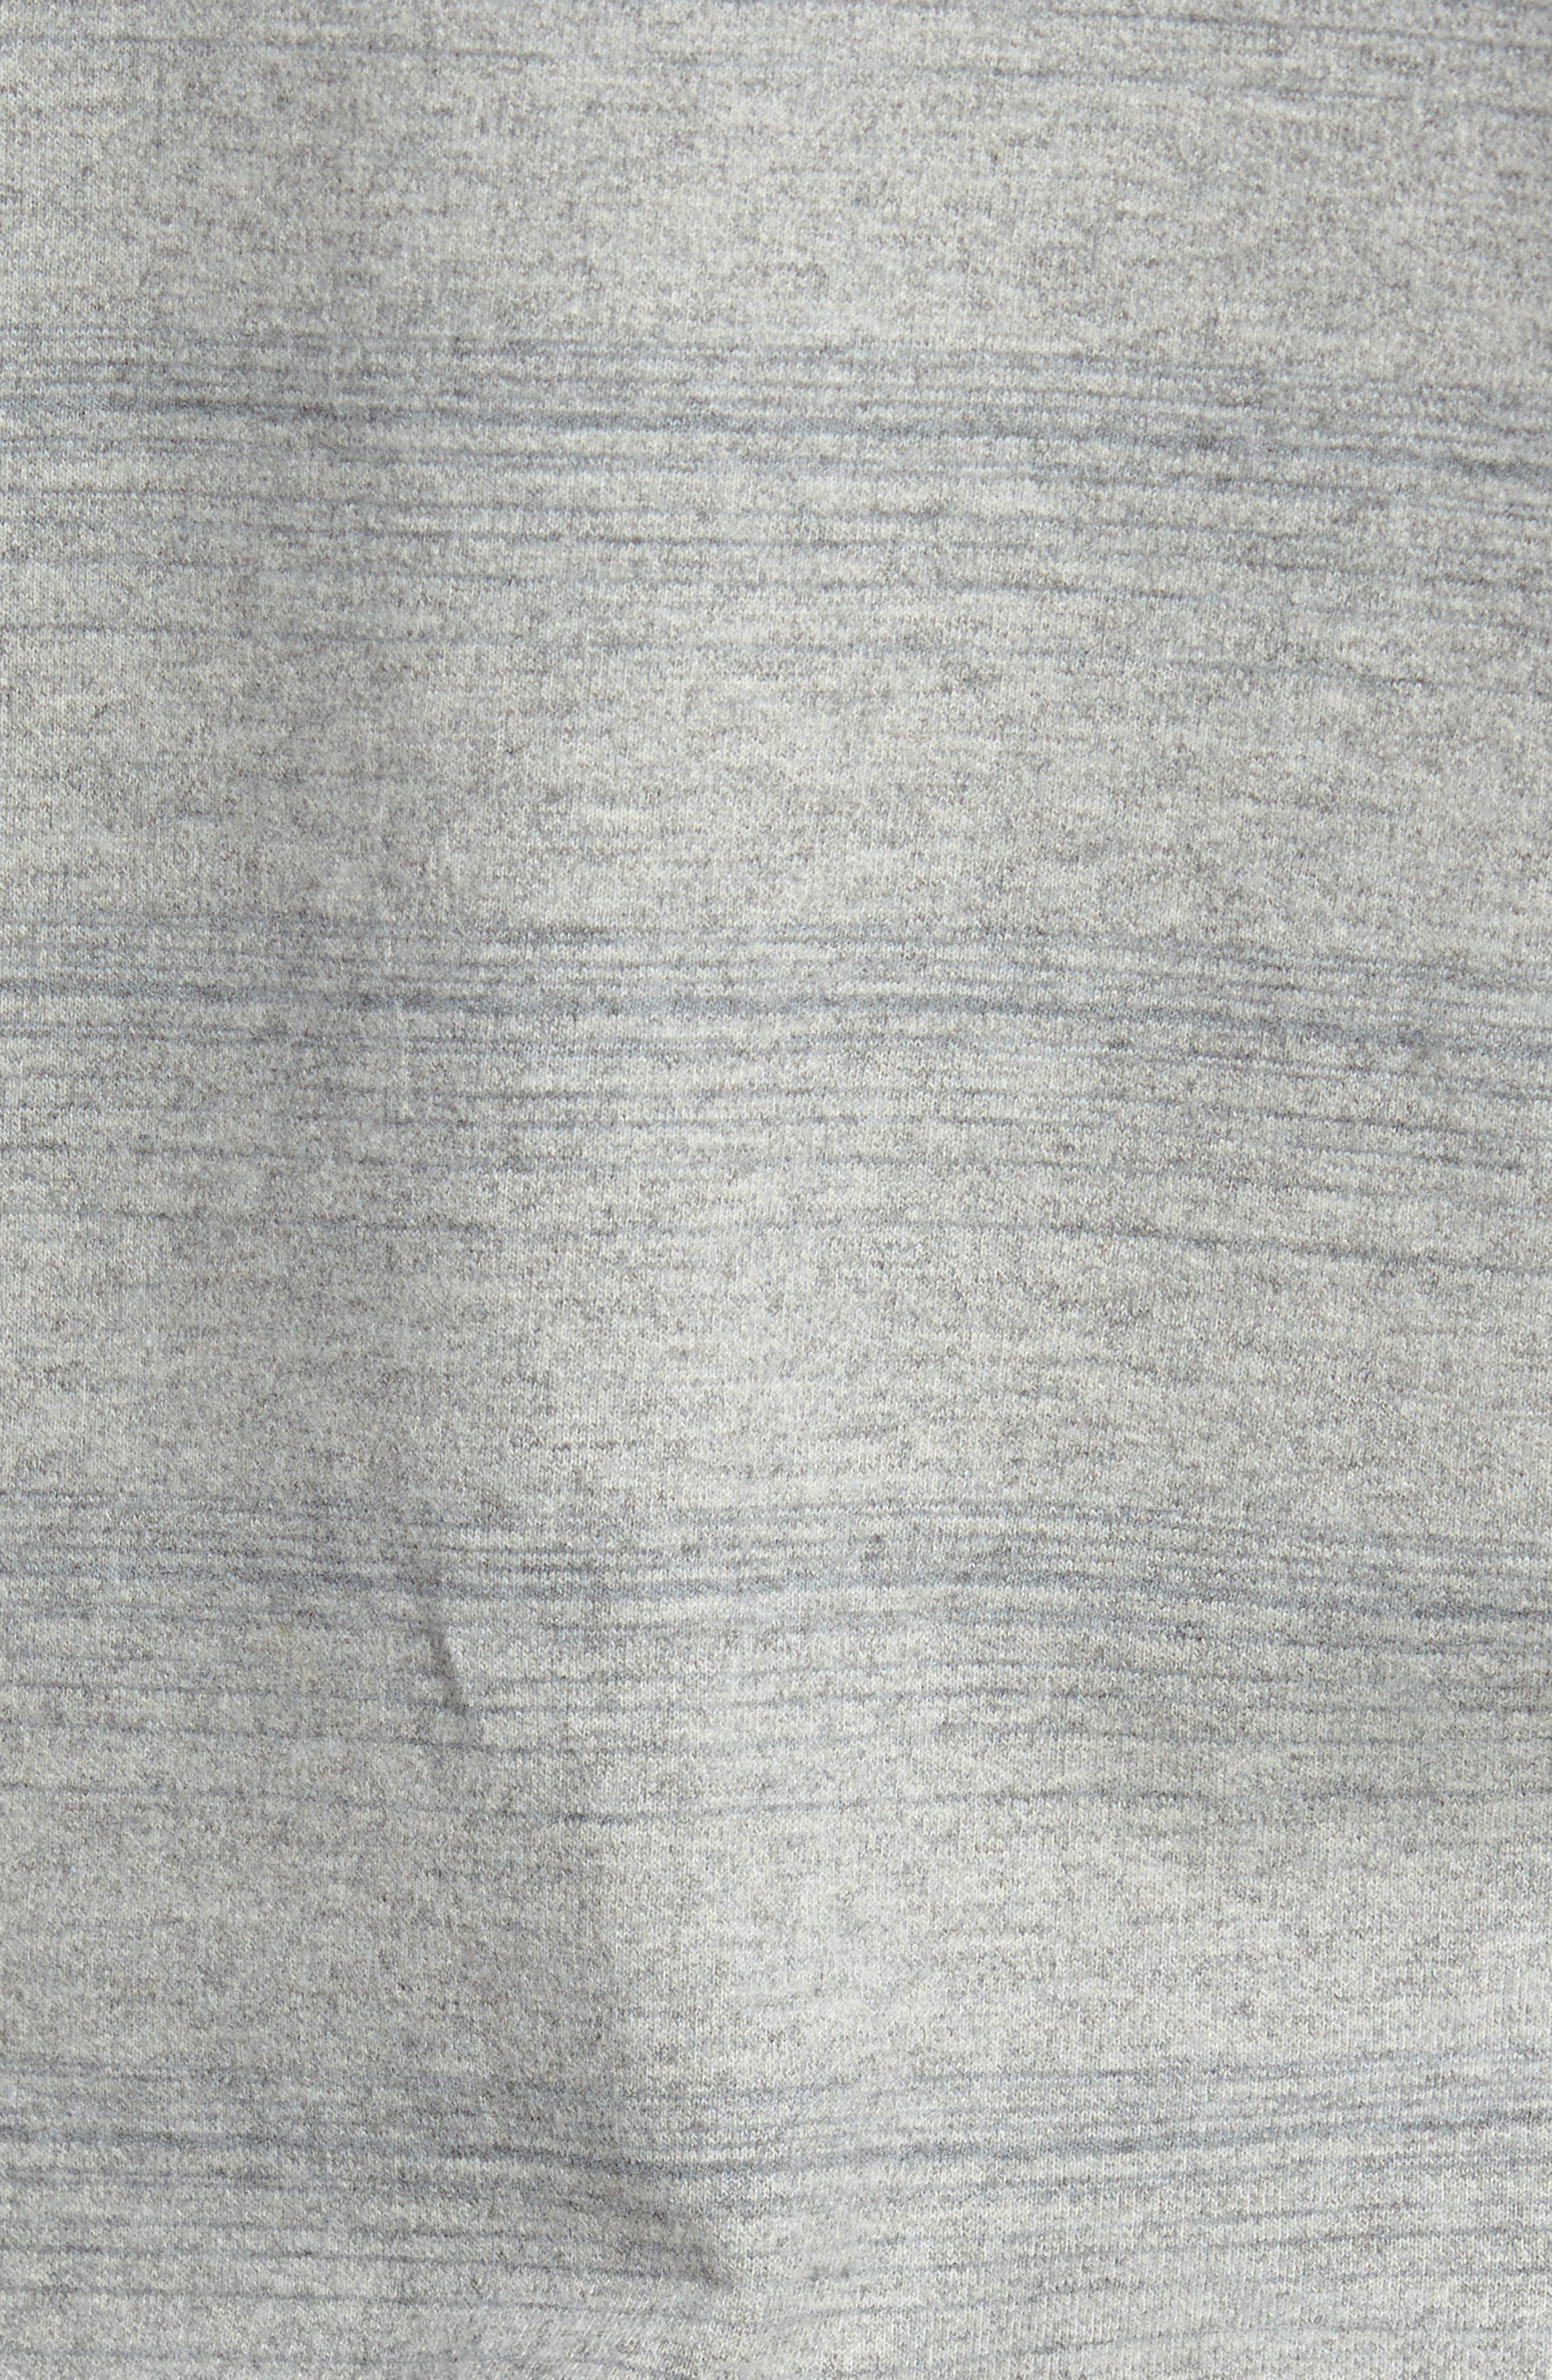 Striped Crewneck Sweater,                             Alternate thumbnail 5, color,                             035